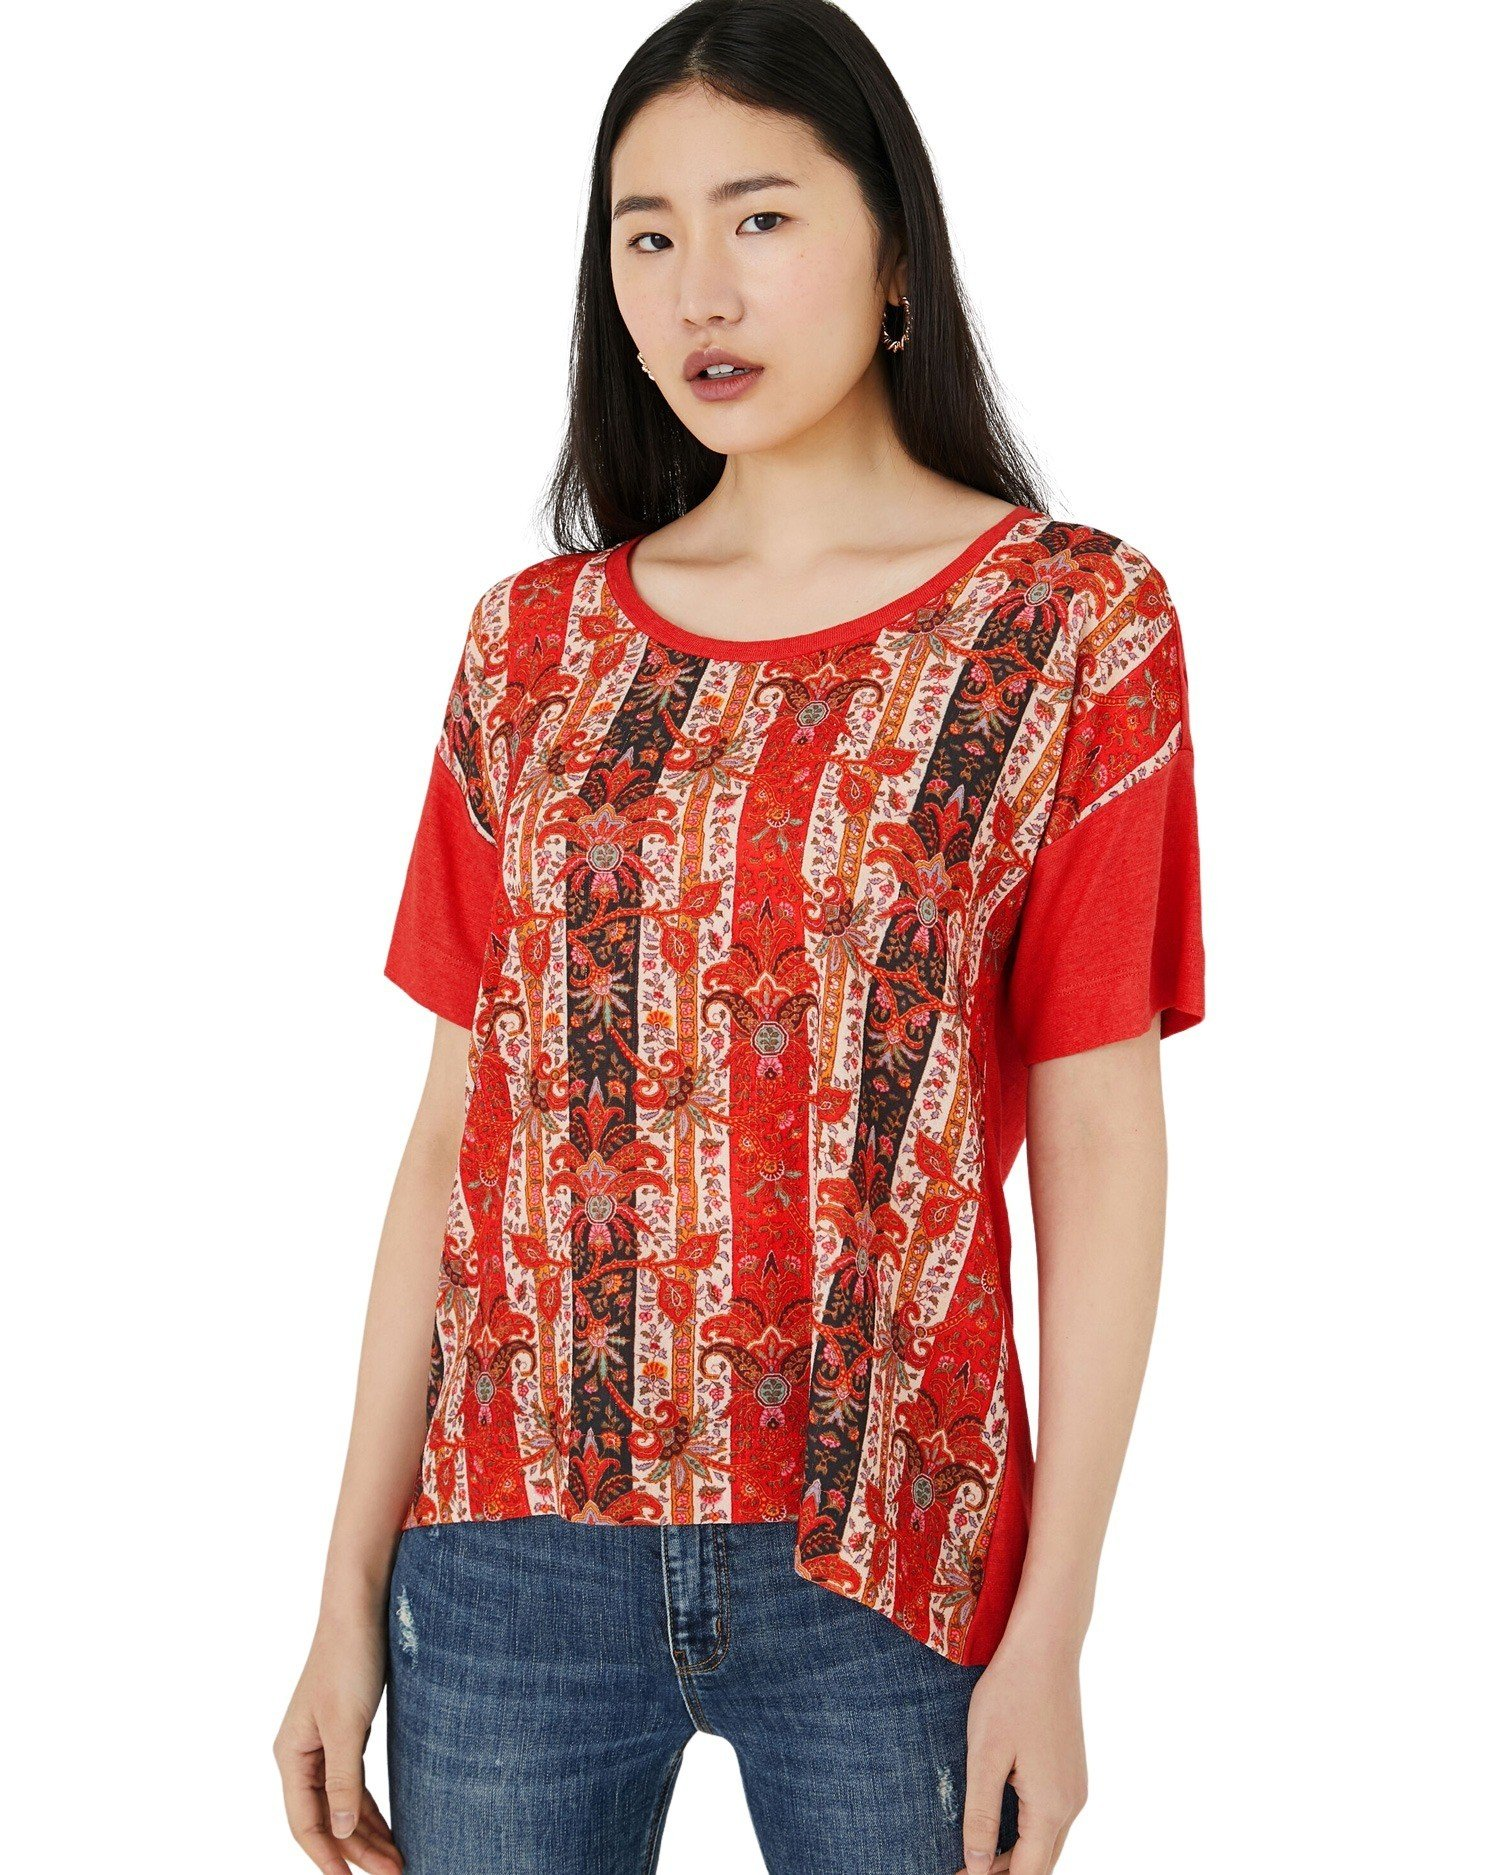 Desigual Women's T-Shirt Various Colours 252717 - red XL